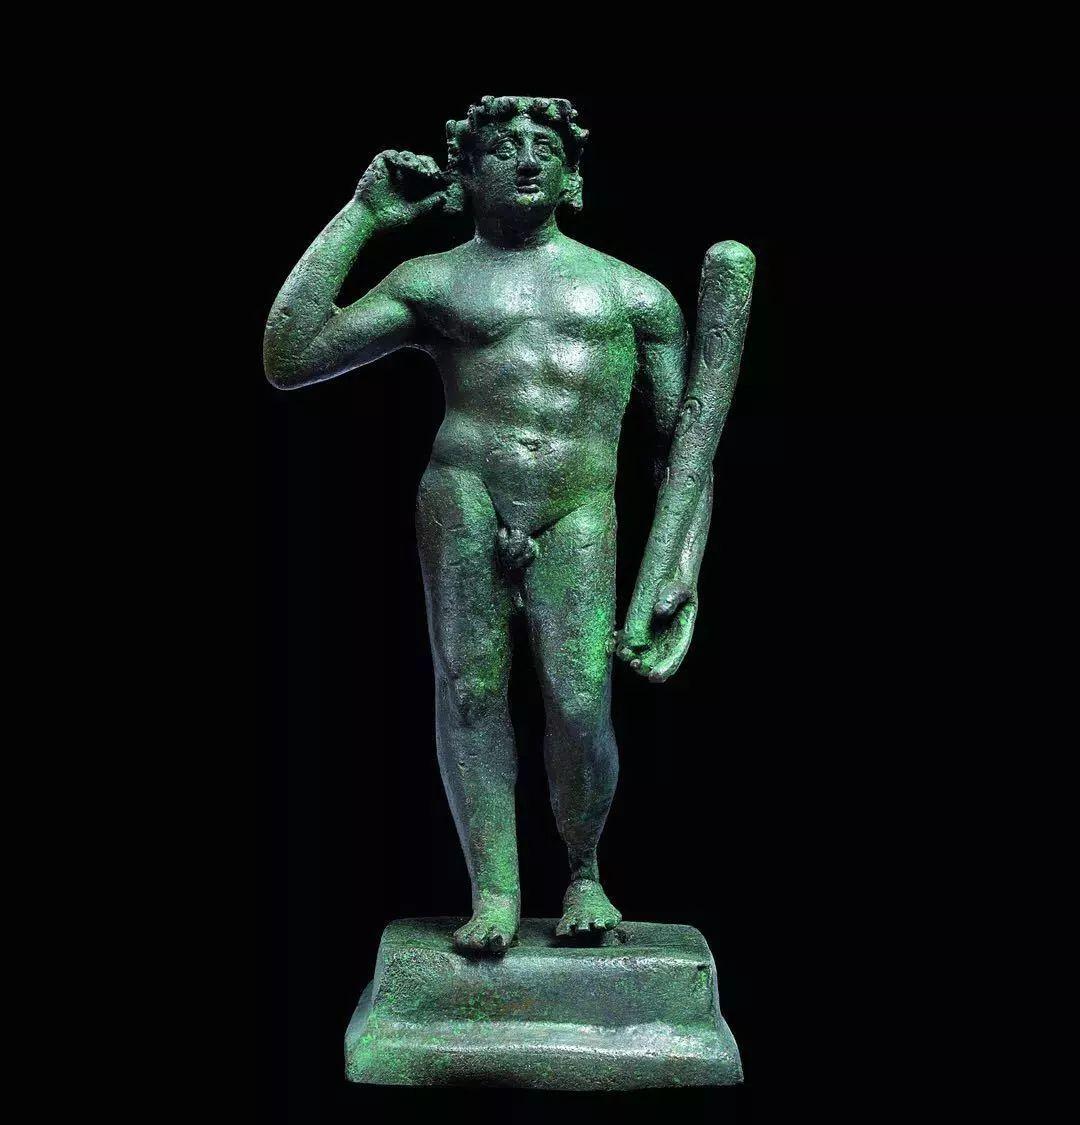 Nanshan Museum to exhibit Afghan relics 阿富汗国家博物馆藏珍宝展